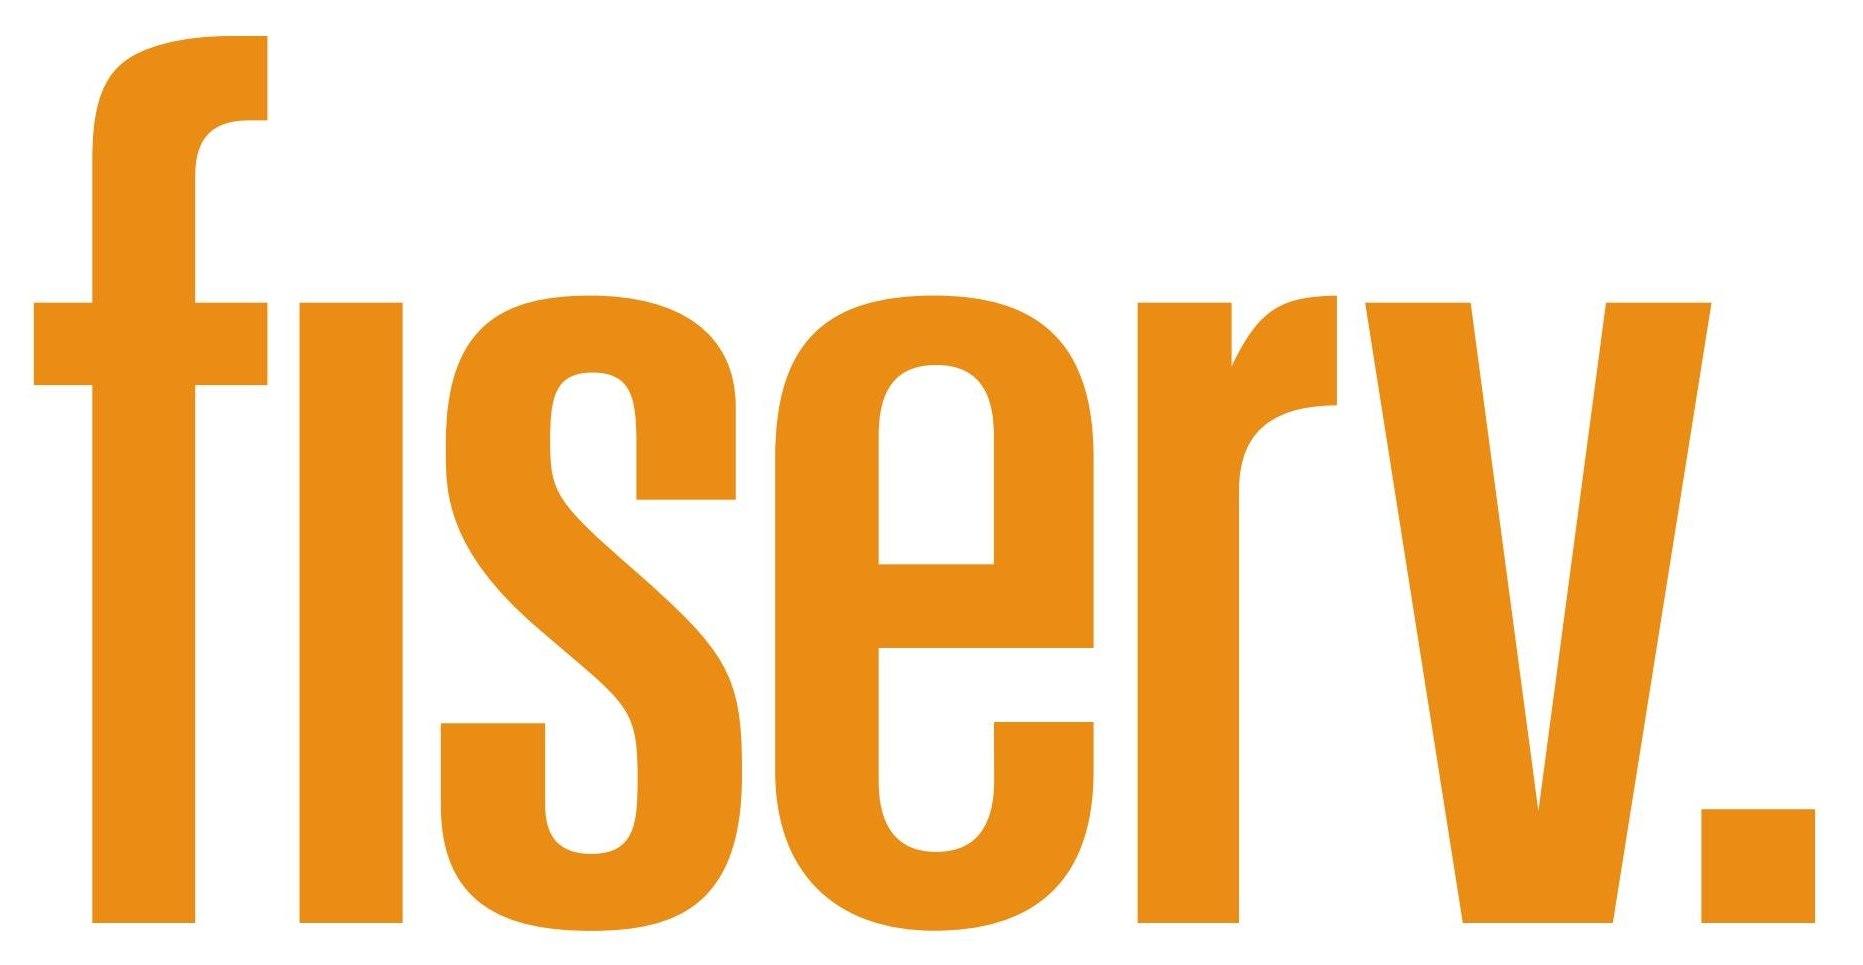 Fiserv Logo png